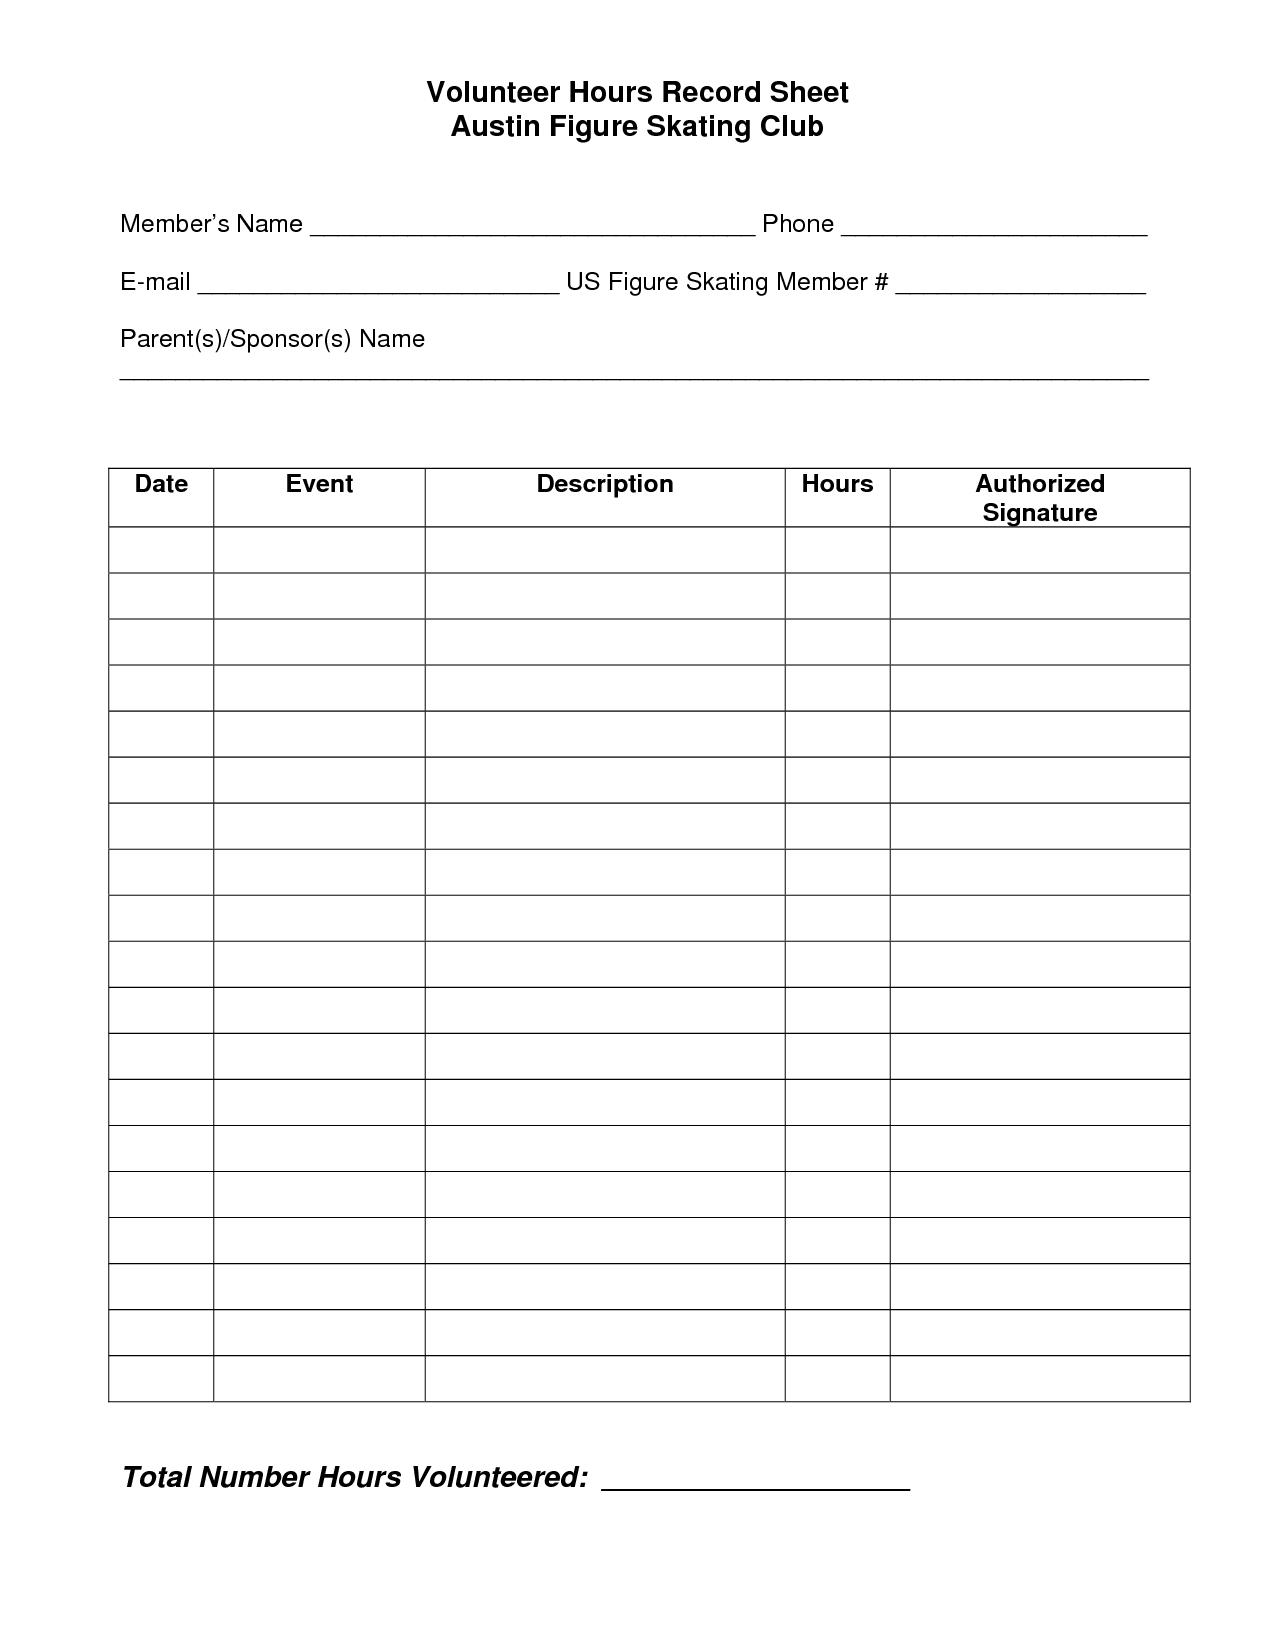 Volunteer Hours Log Sheet Template   Spreedsheets   Pinterest - Free Printable Community Service Log Sheet